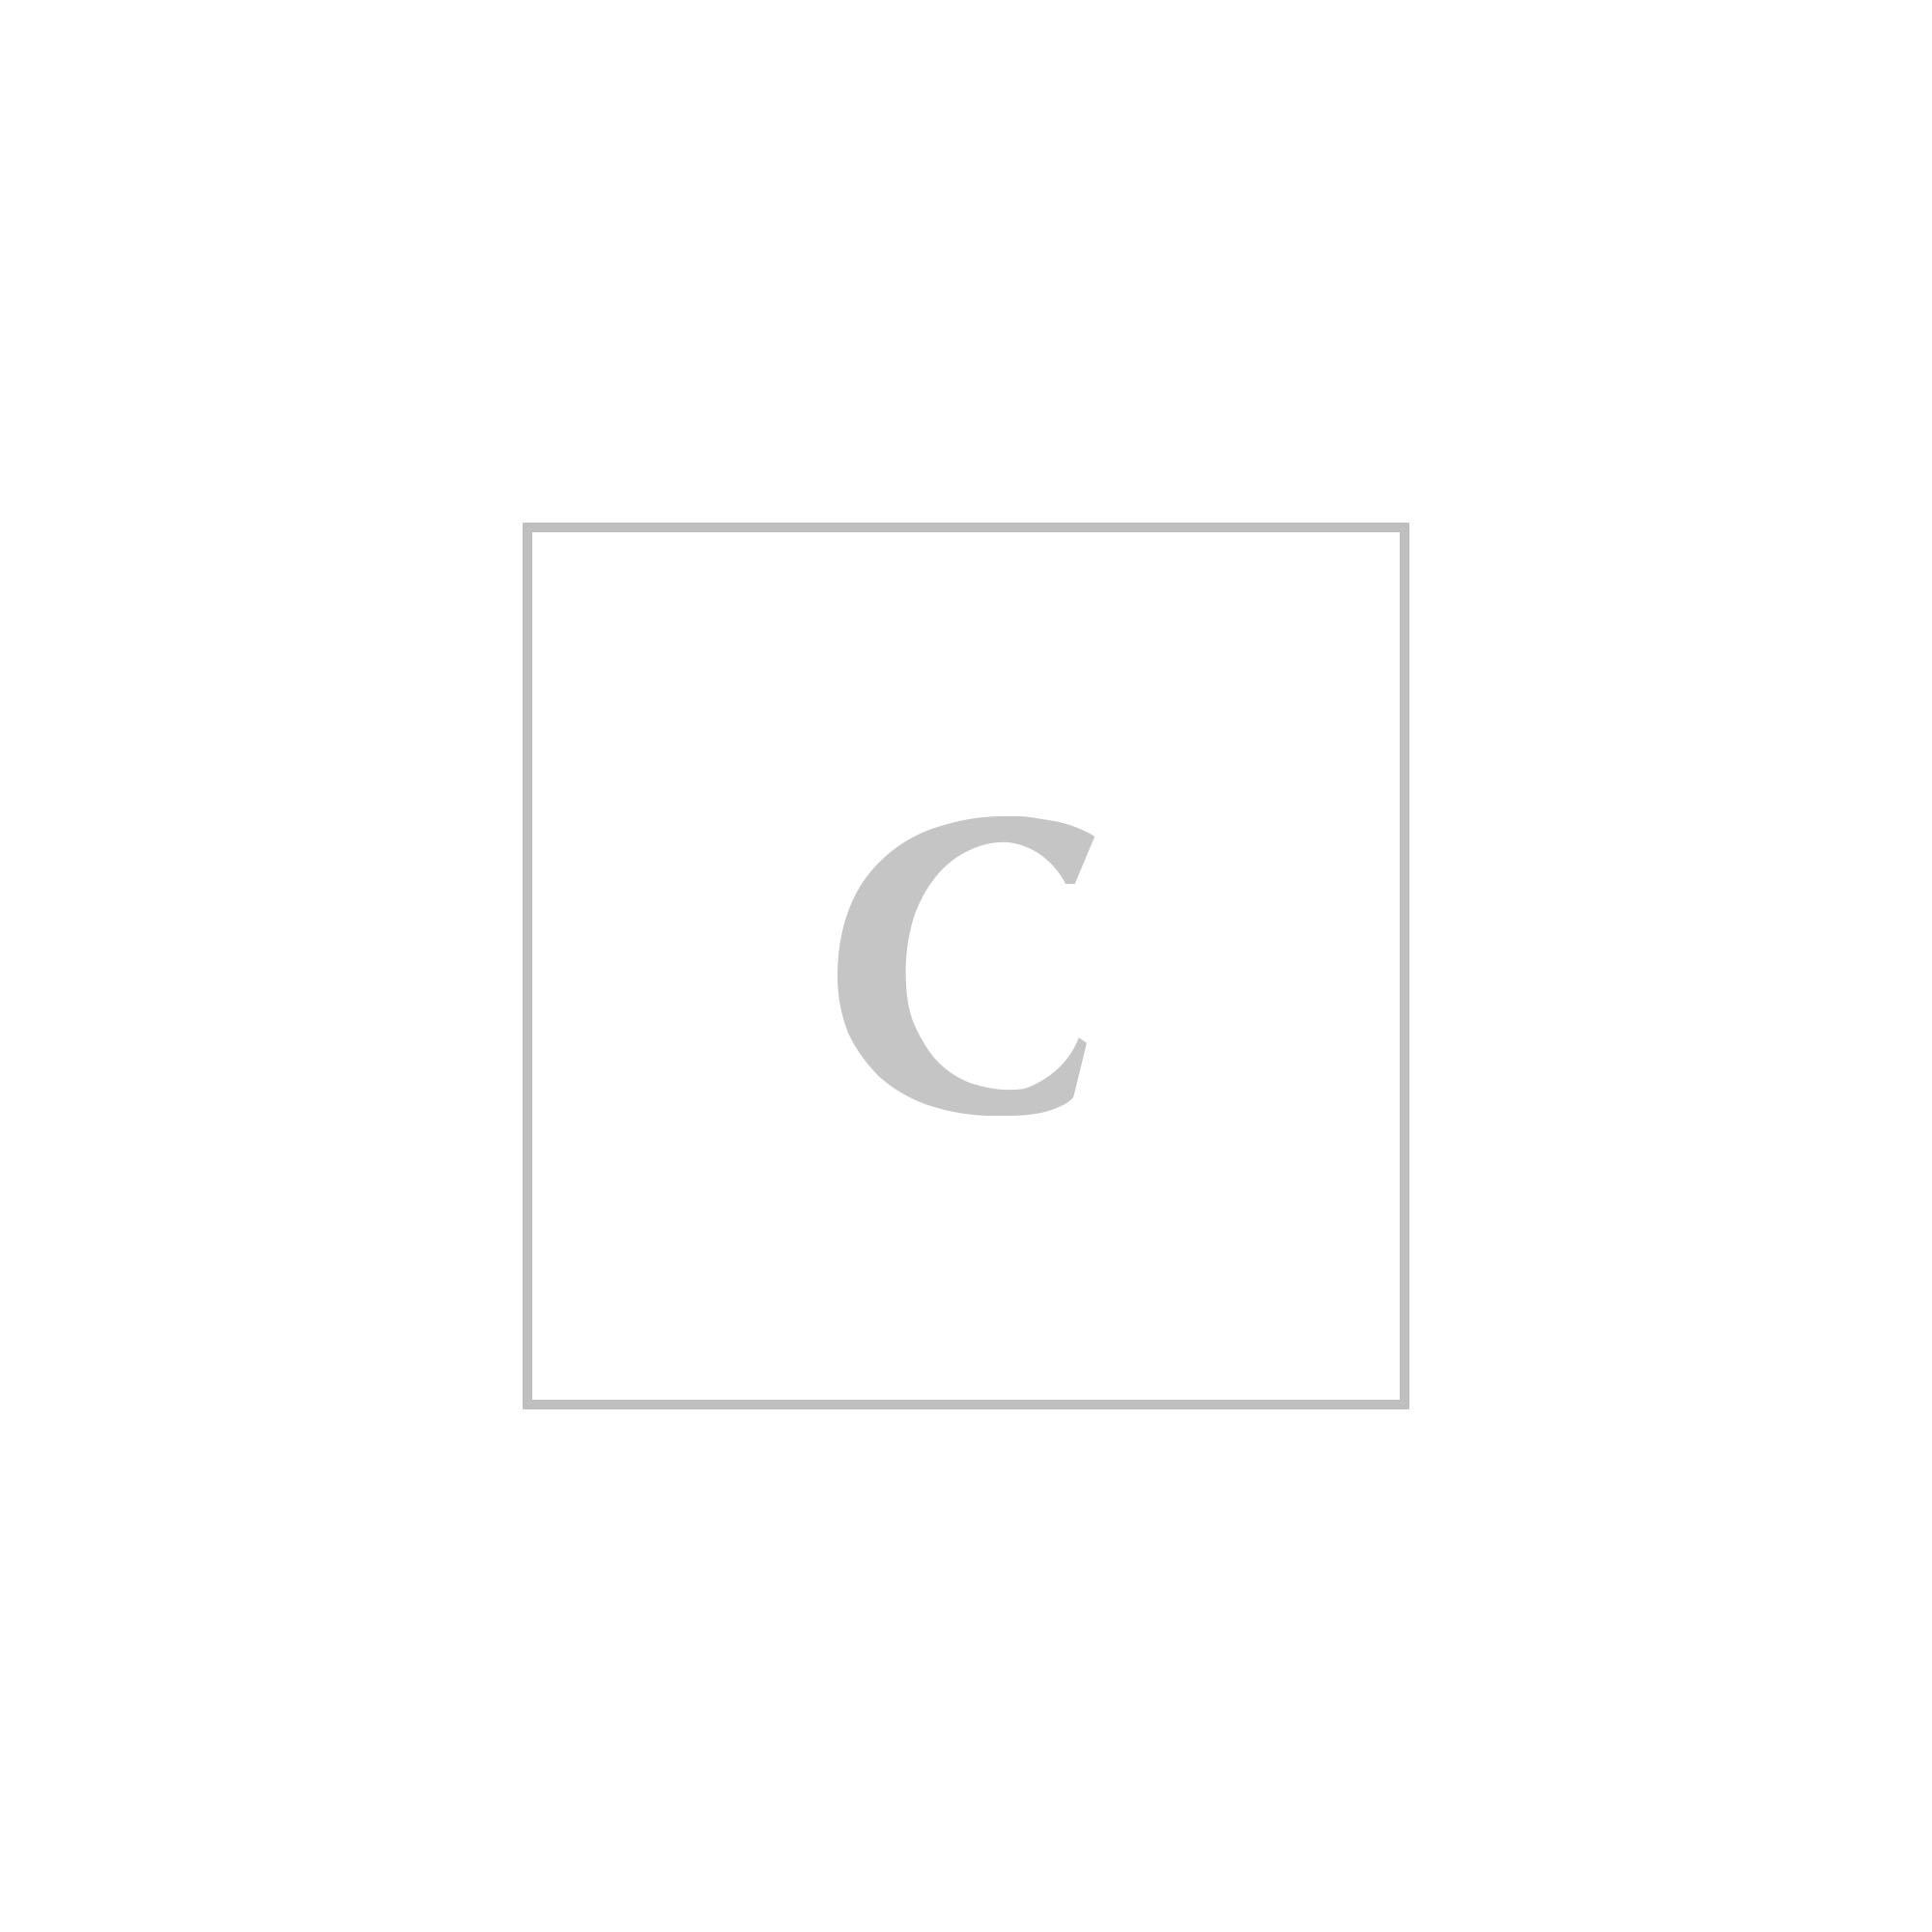 Dolce & gabbana crinkled leather keychain